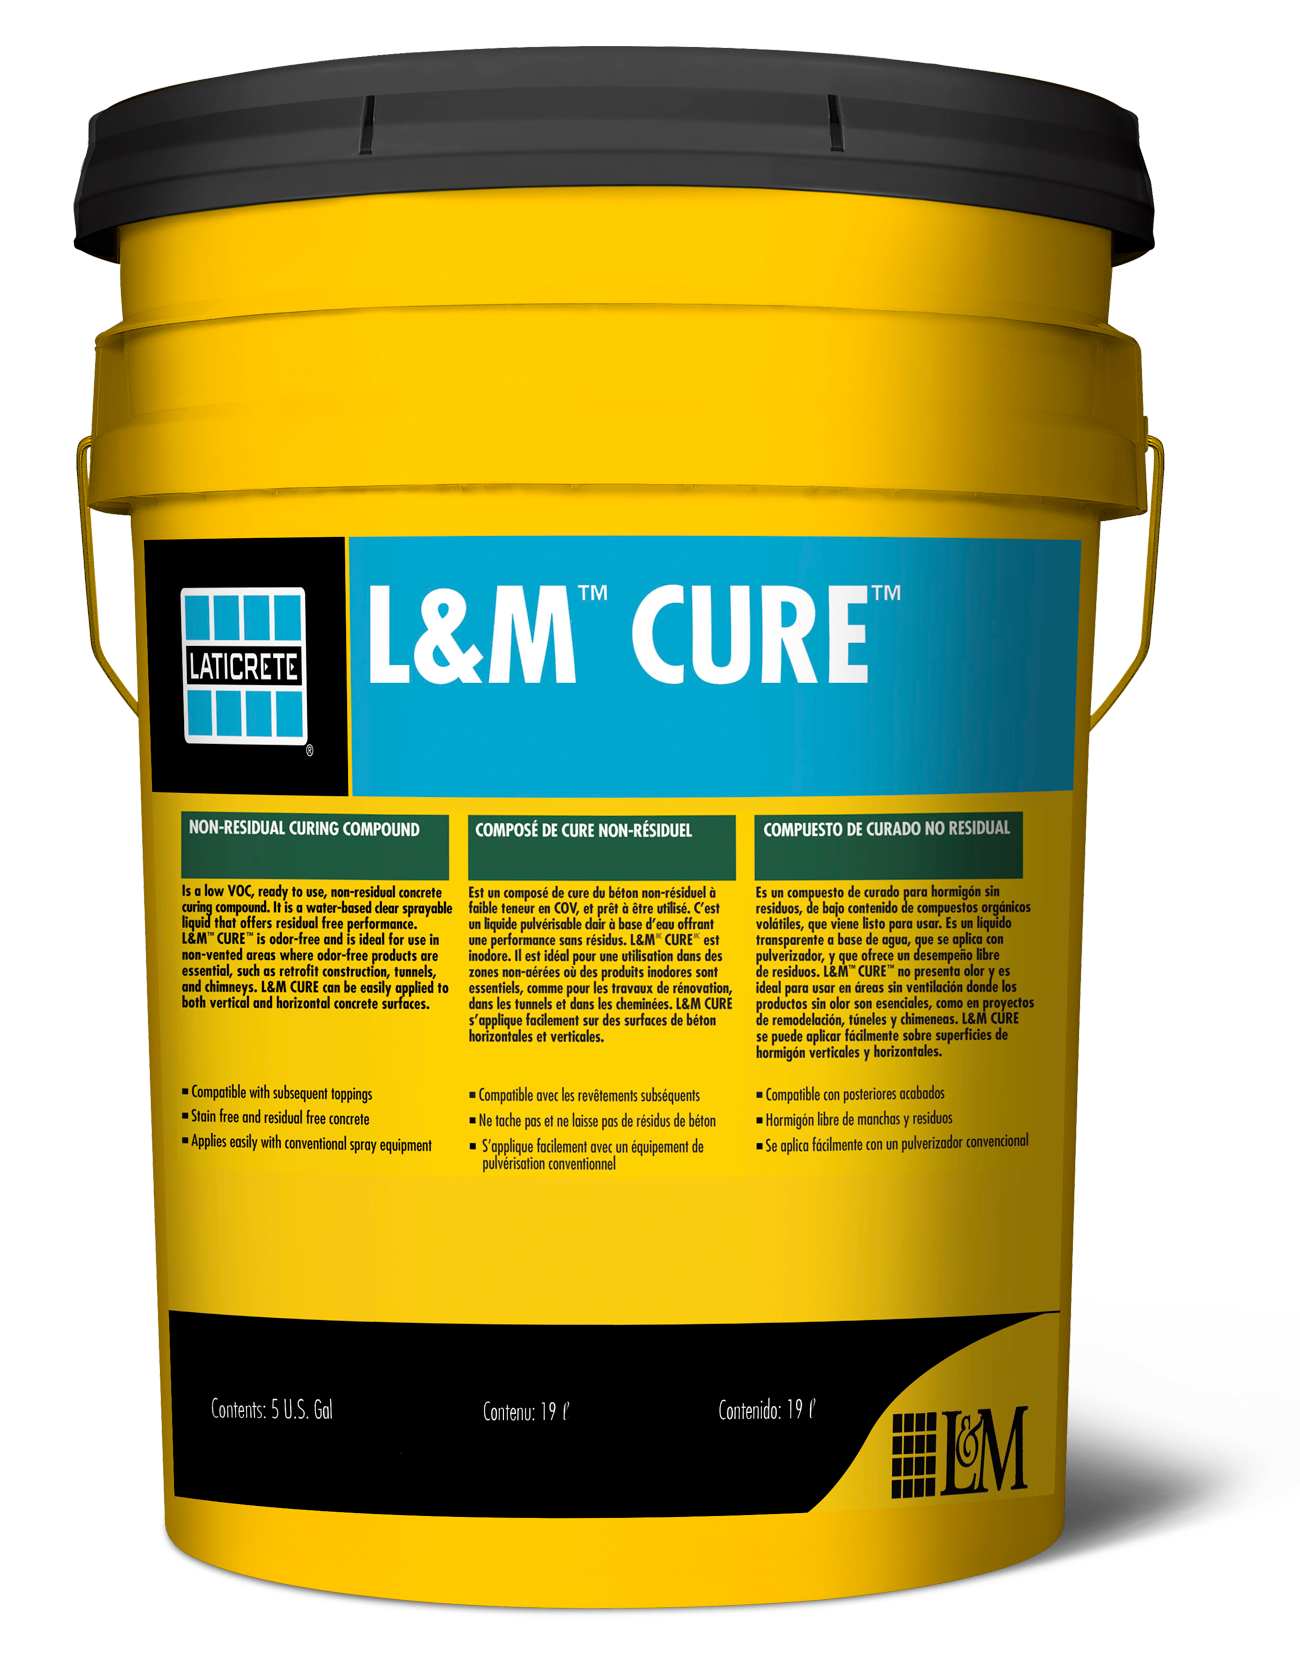 L & M Cure